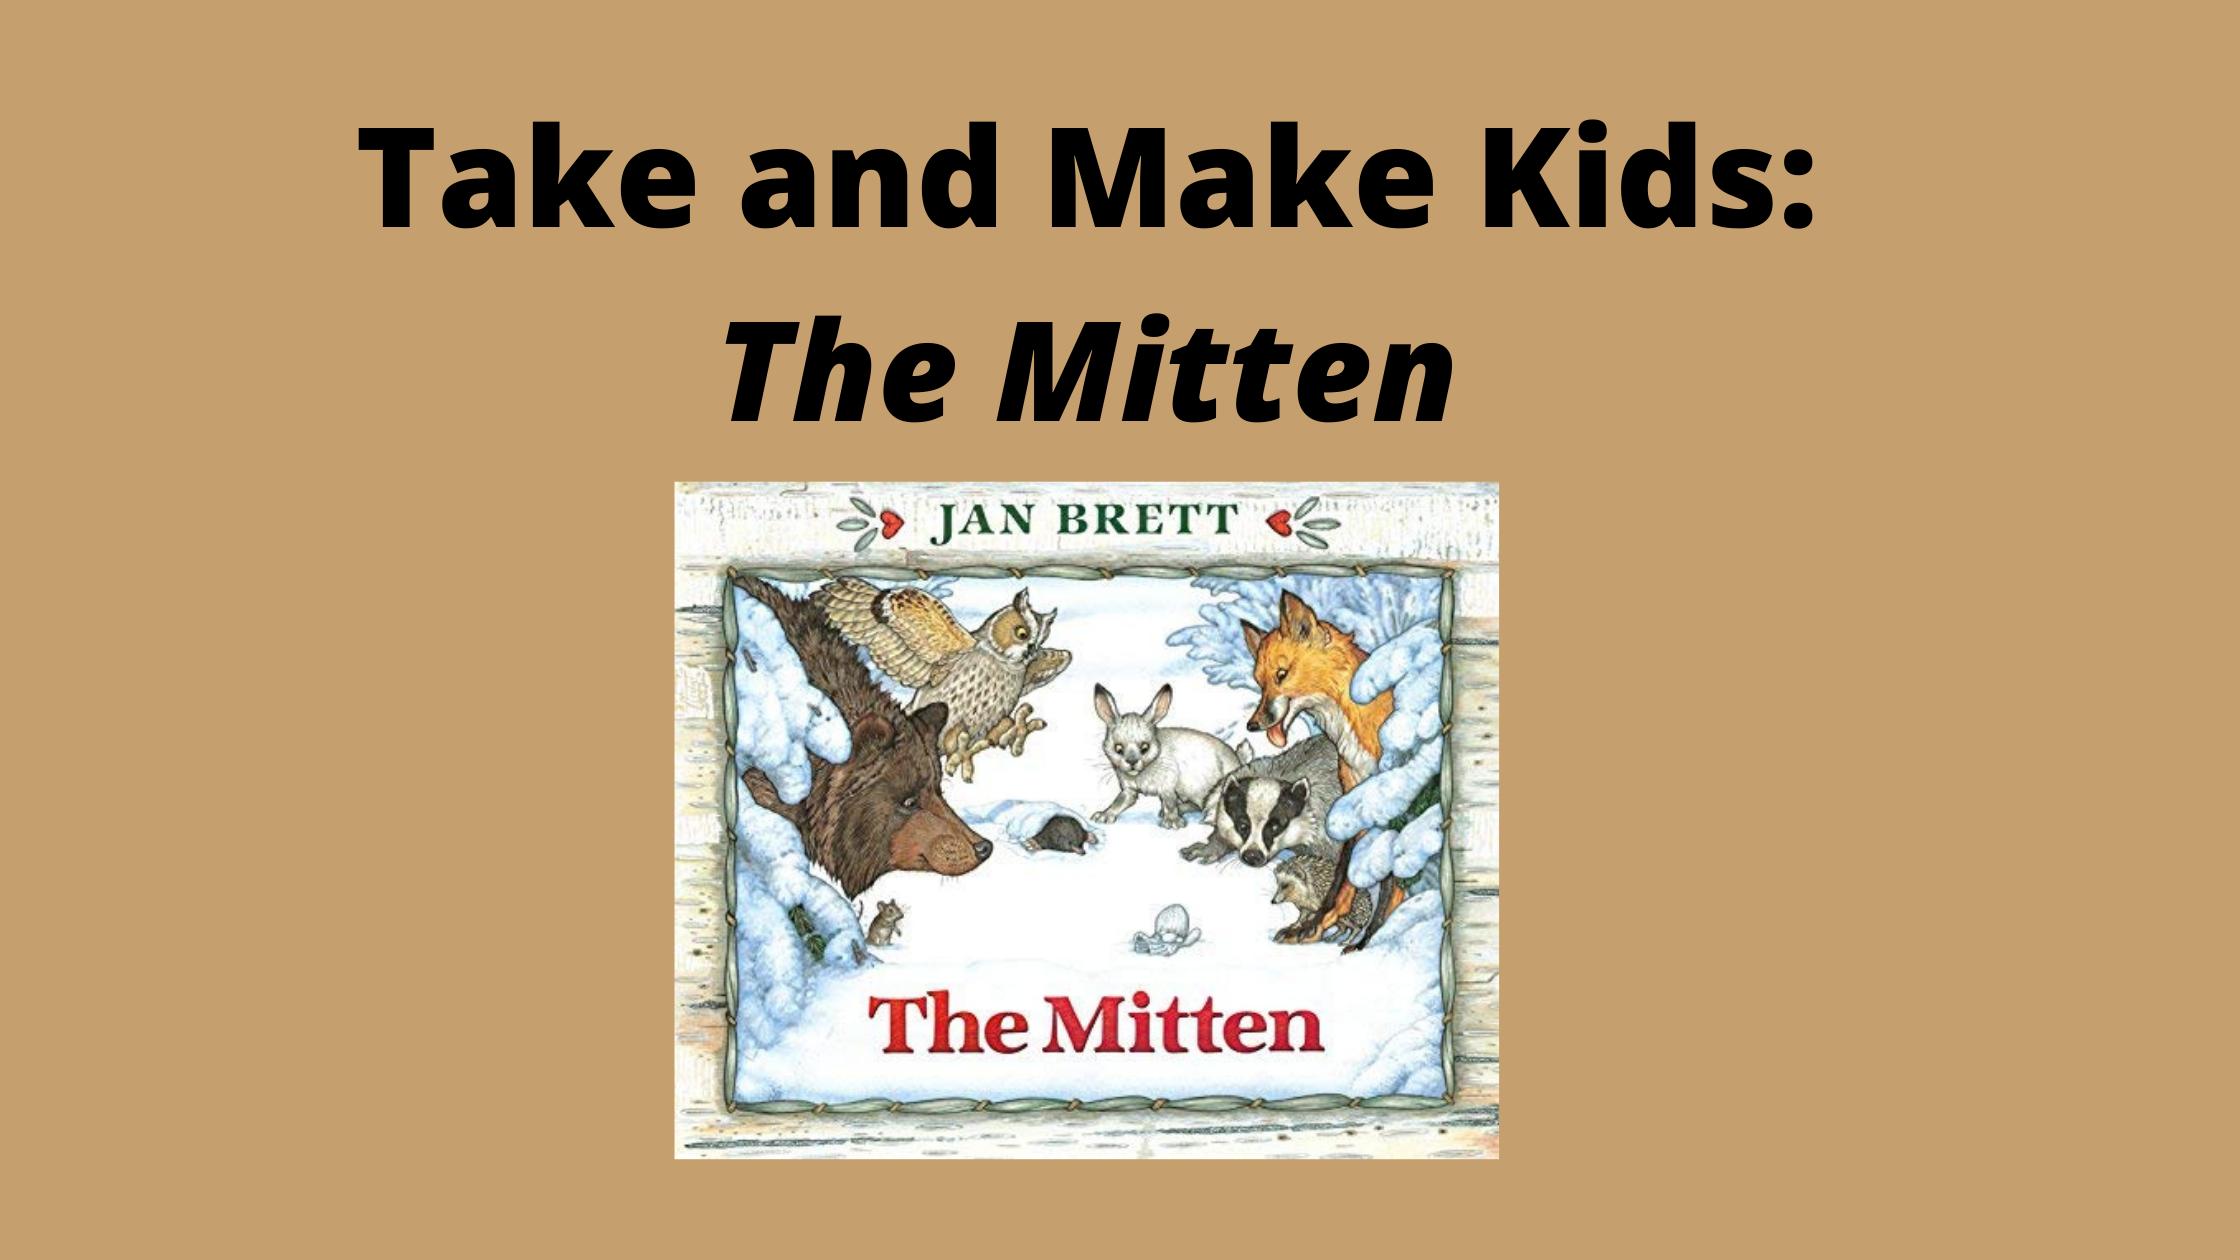 Take and Make Kids: The Mitten